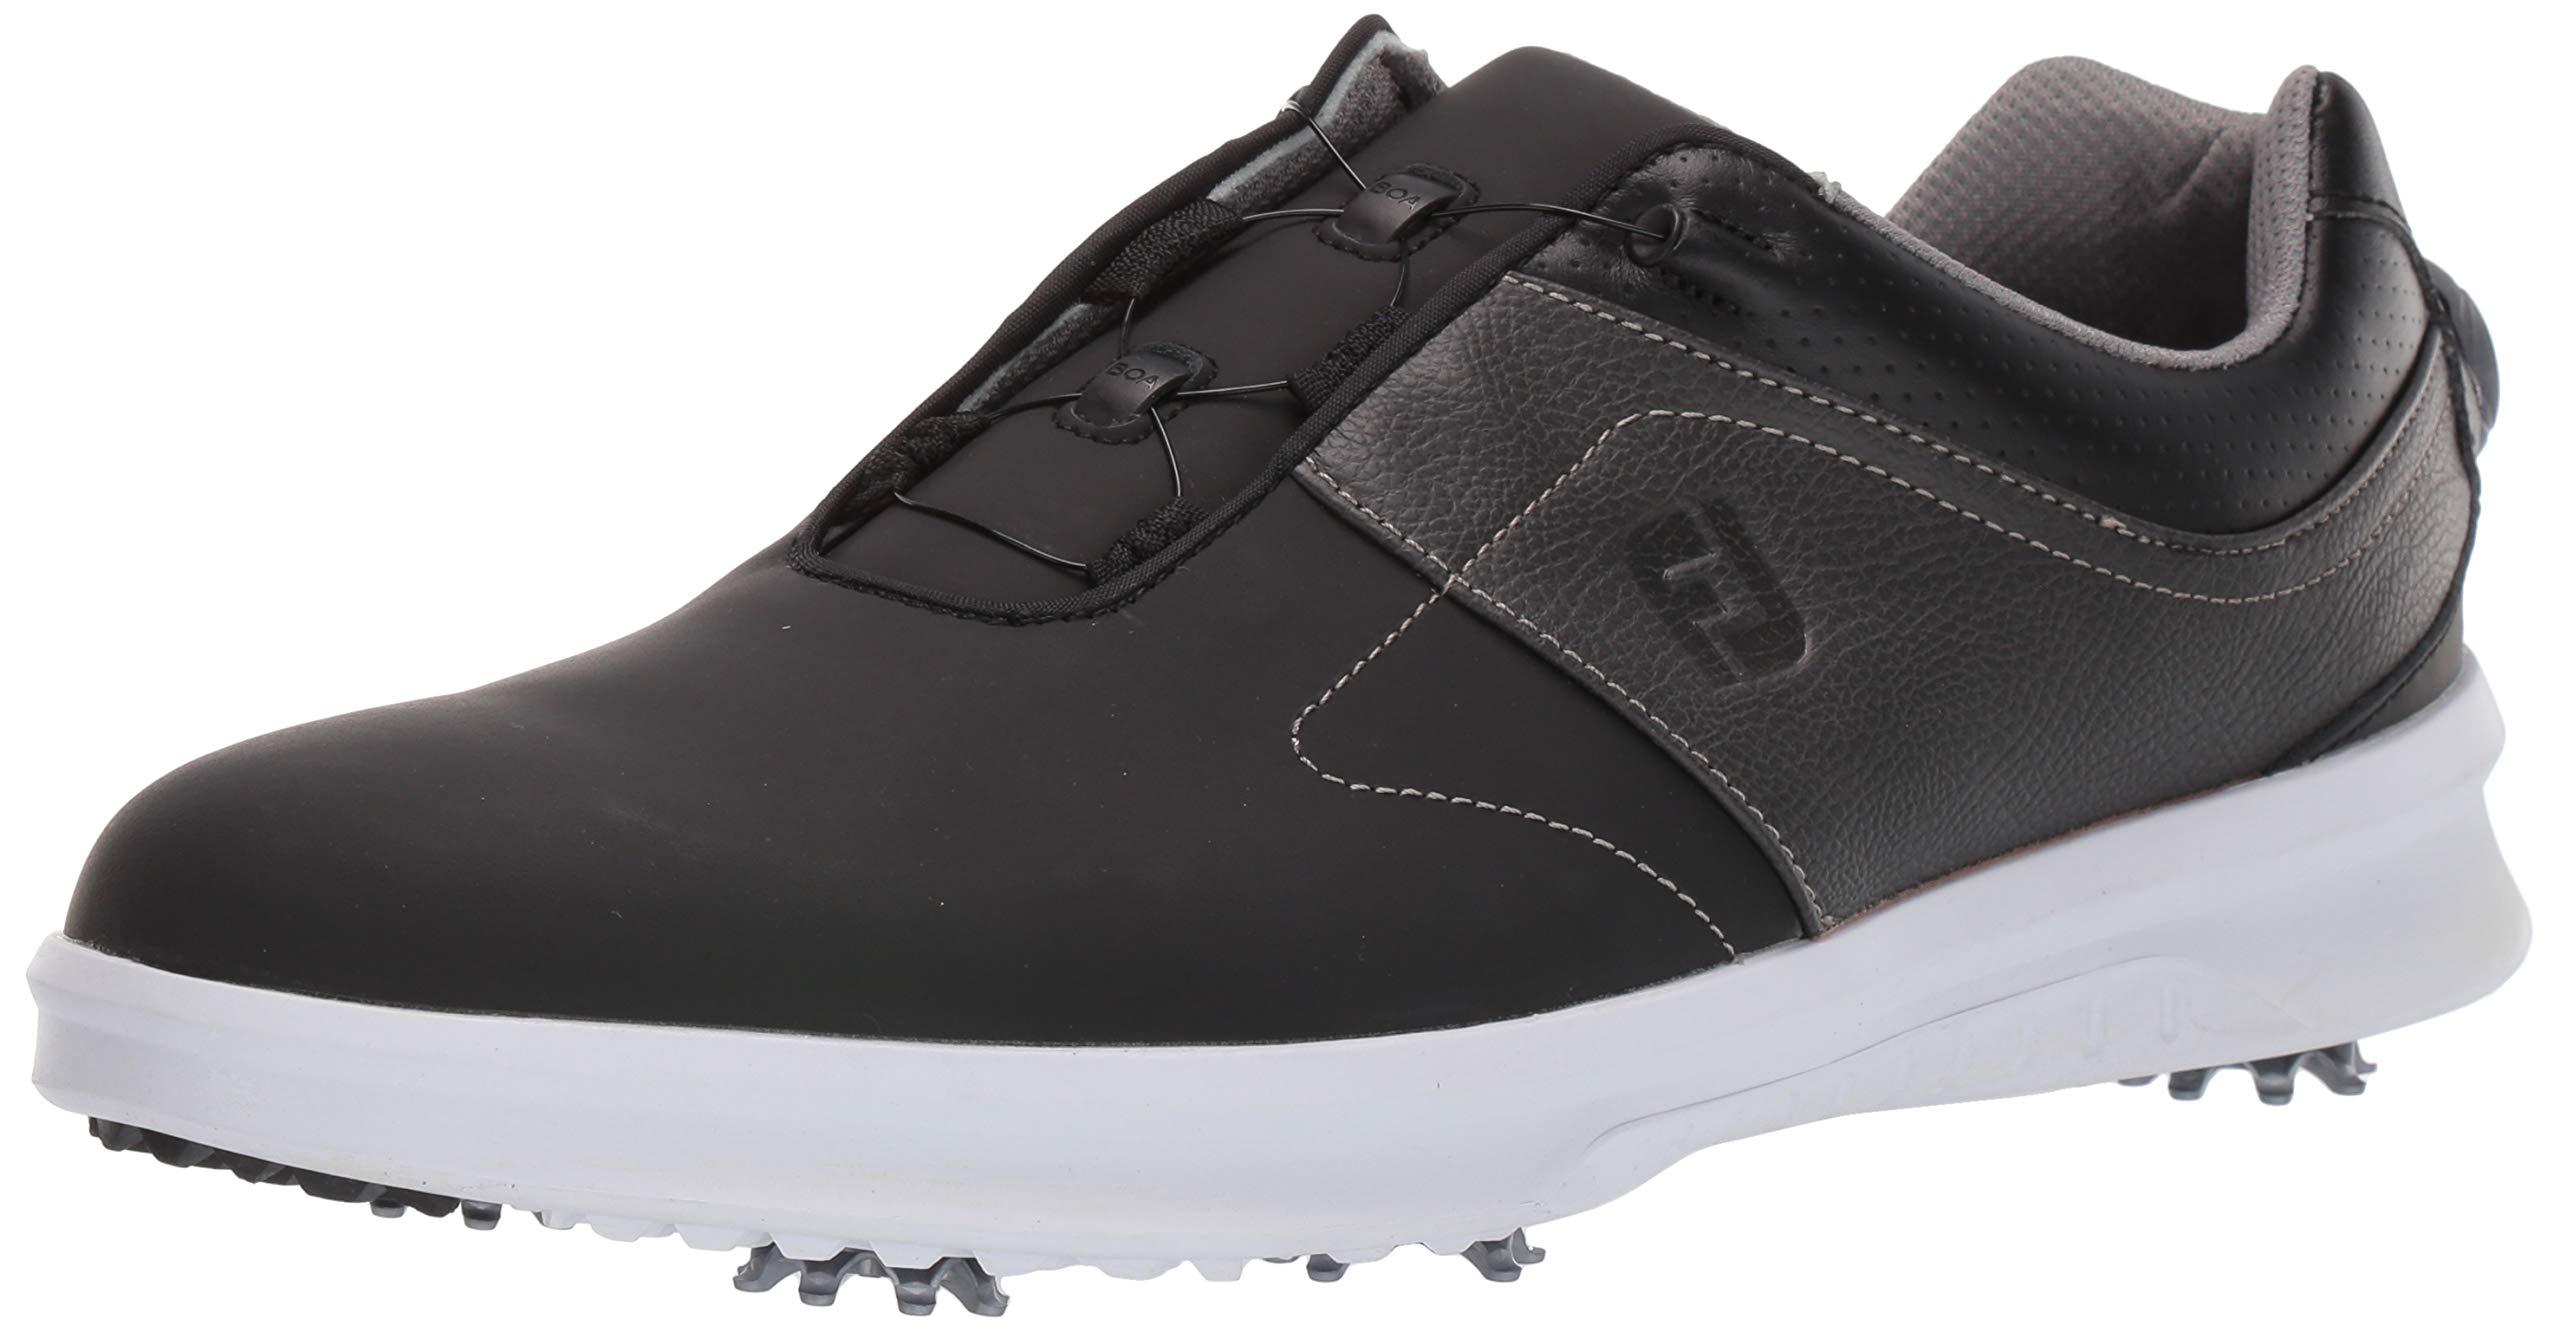 FootJoy Men's Contour Series Boa Golf Shoes, Charcoal, 10.5 M US by FootJoy